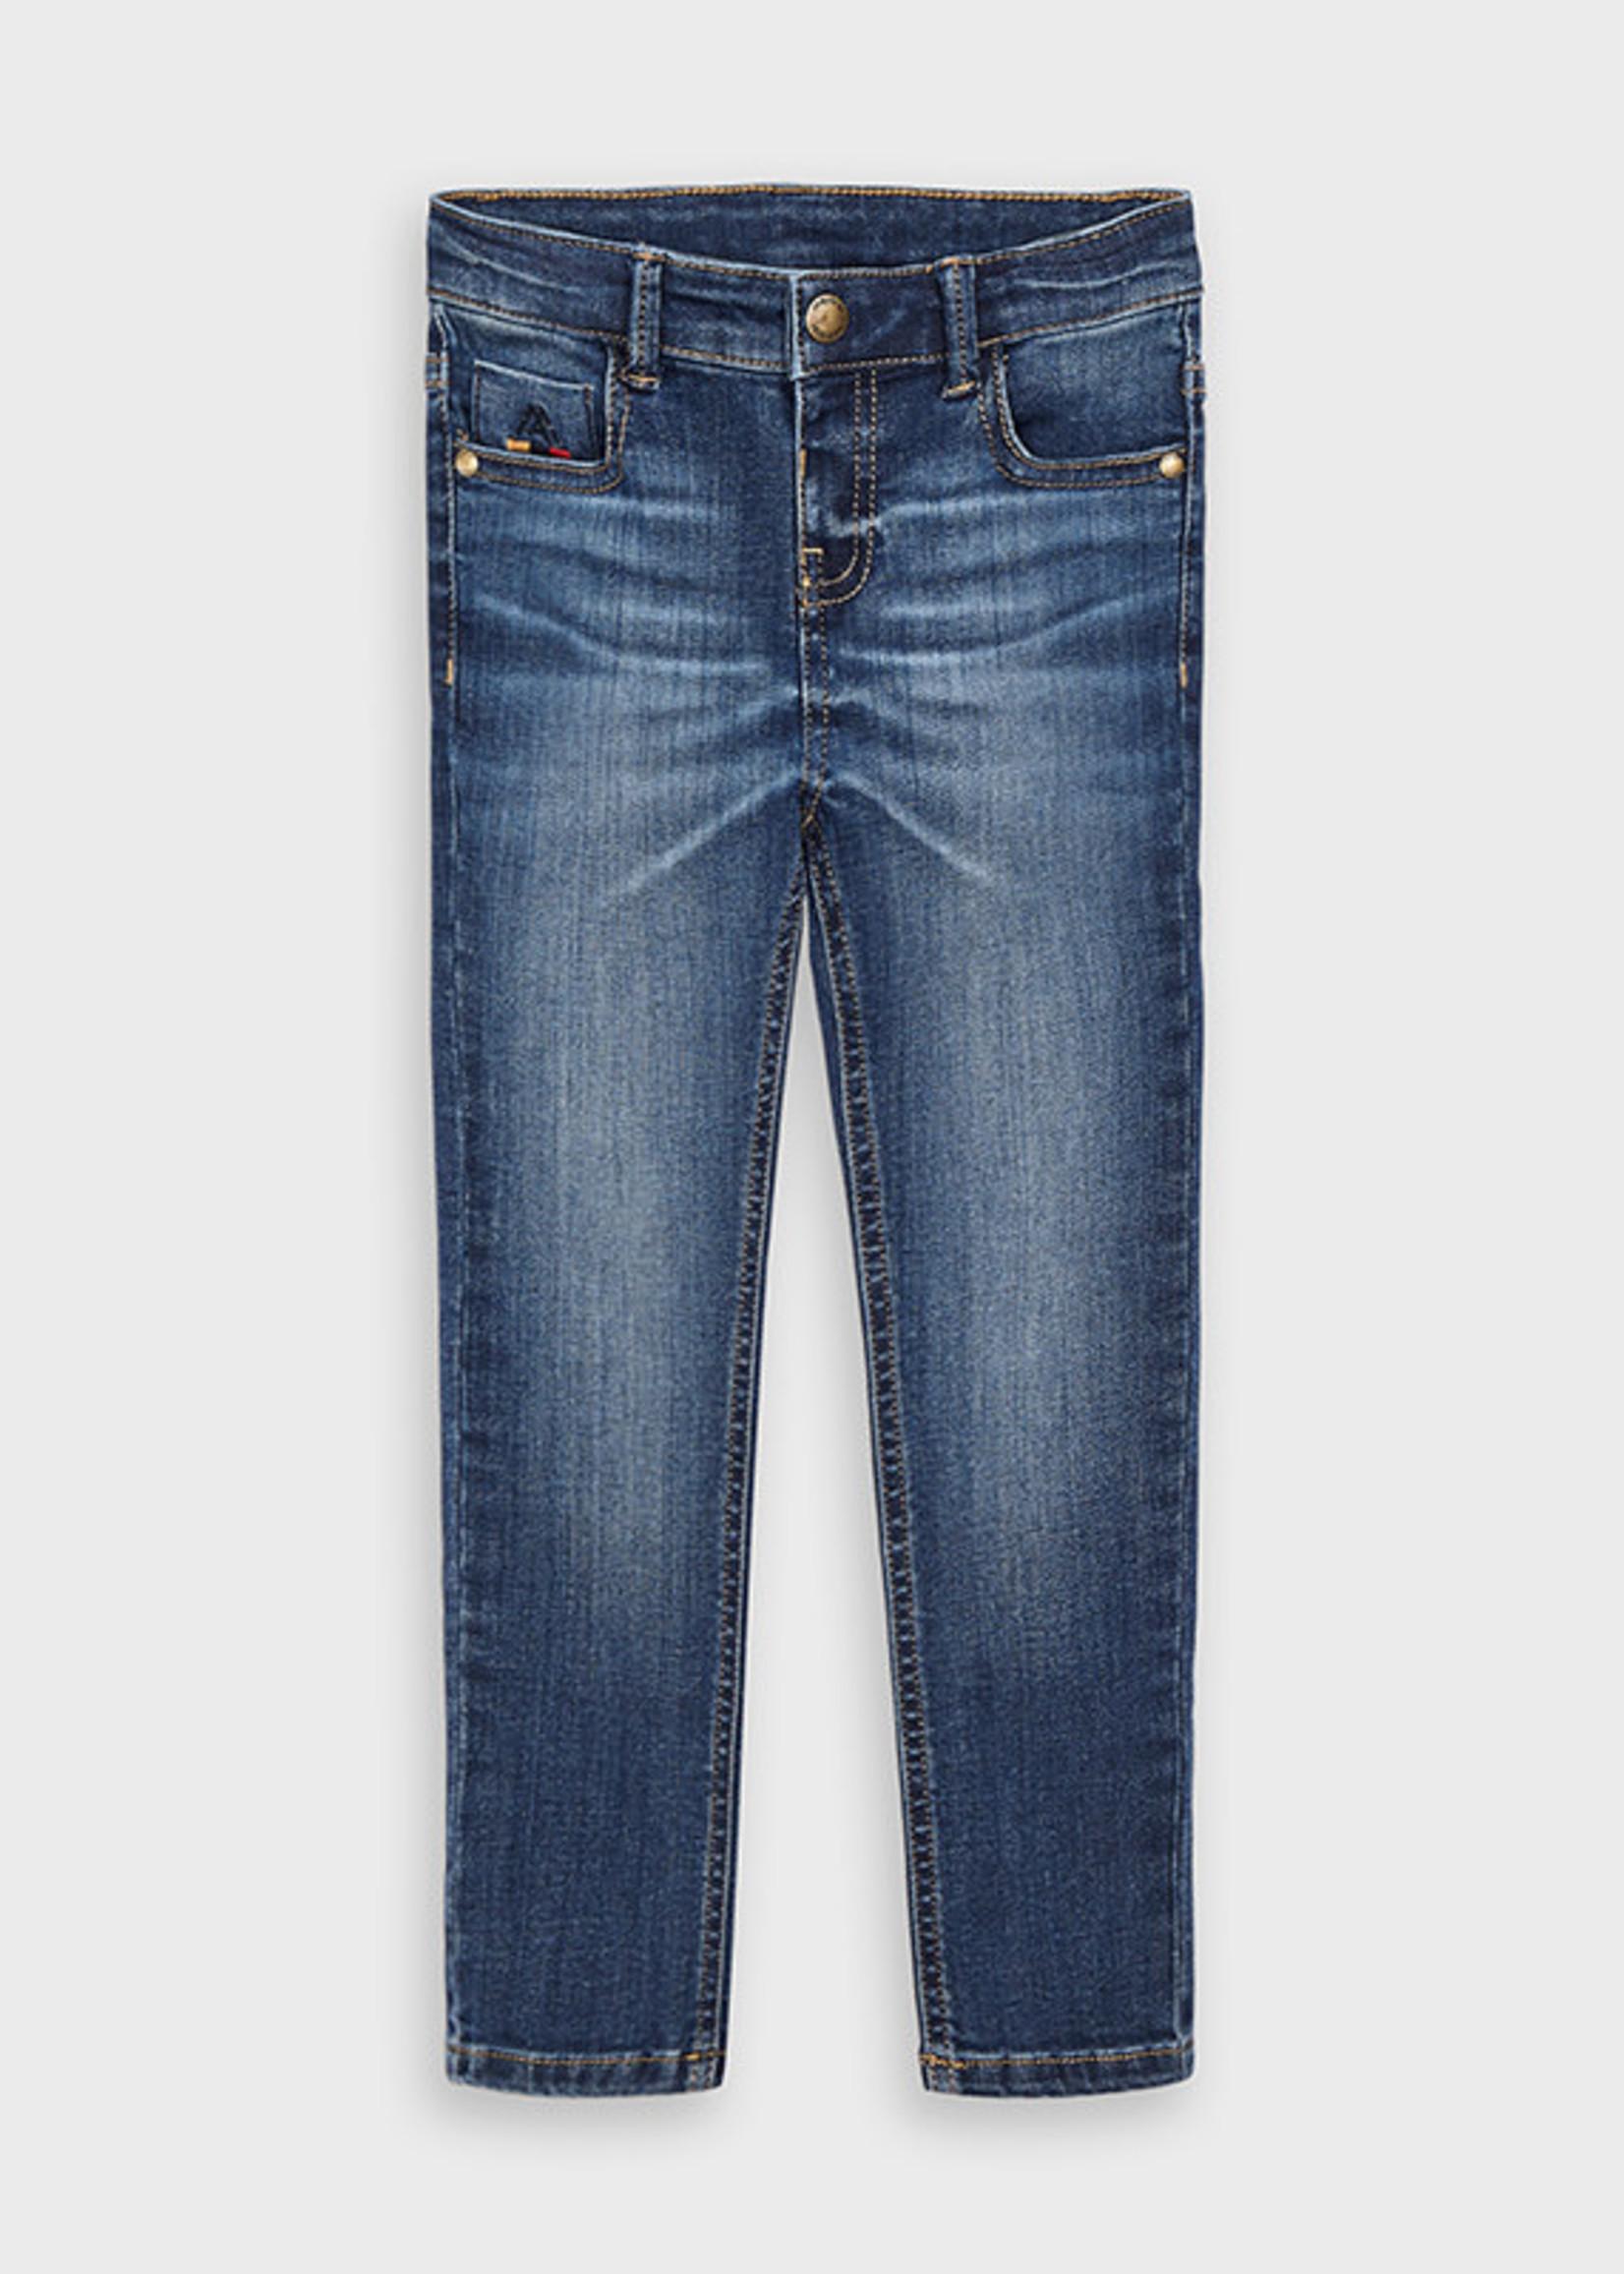 Mayoral mayoral skinny fit jeans